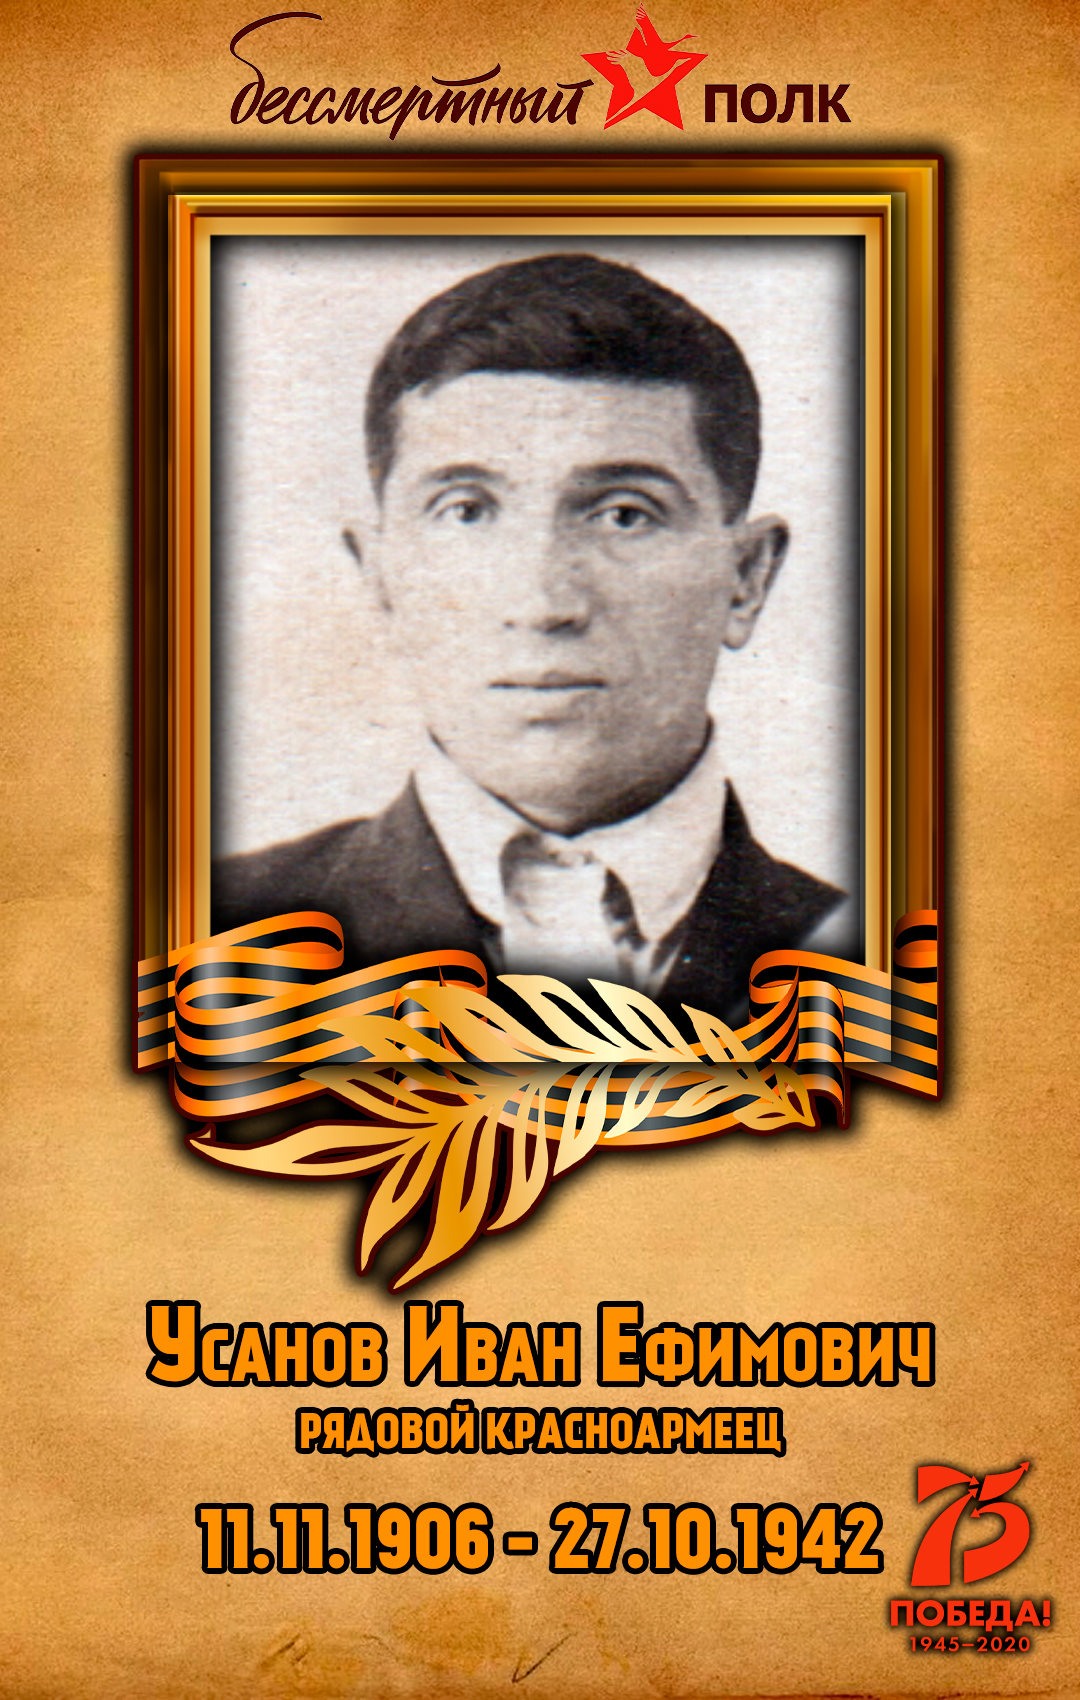 Усанов-Иван-Ефимович